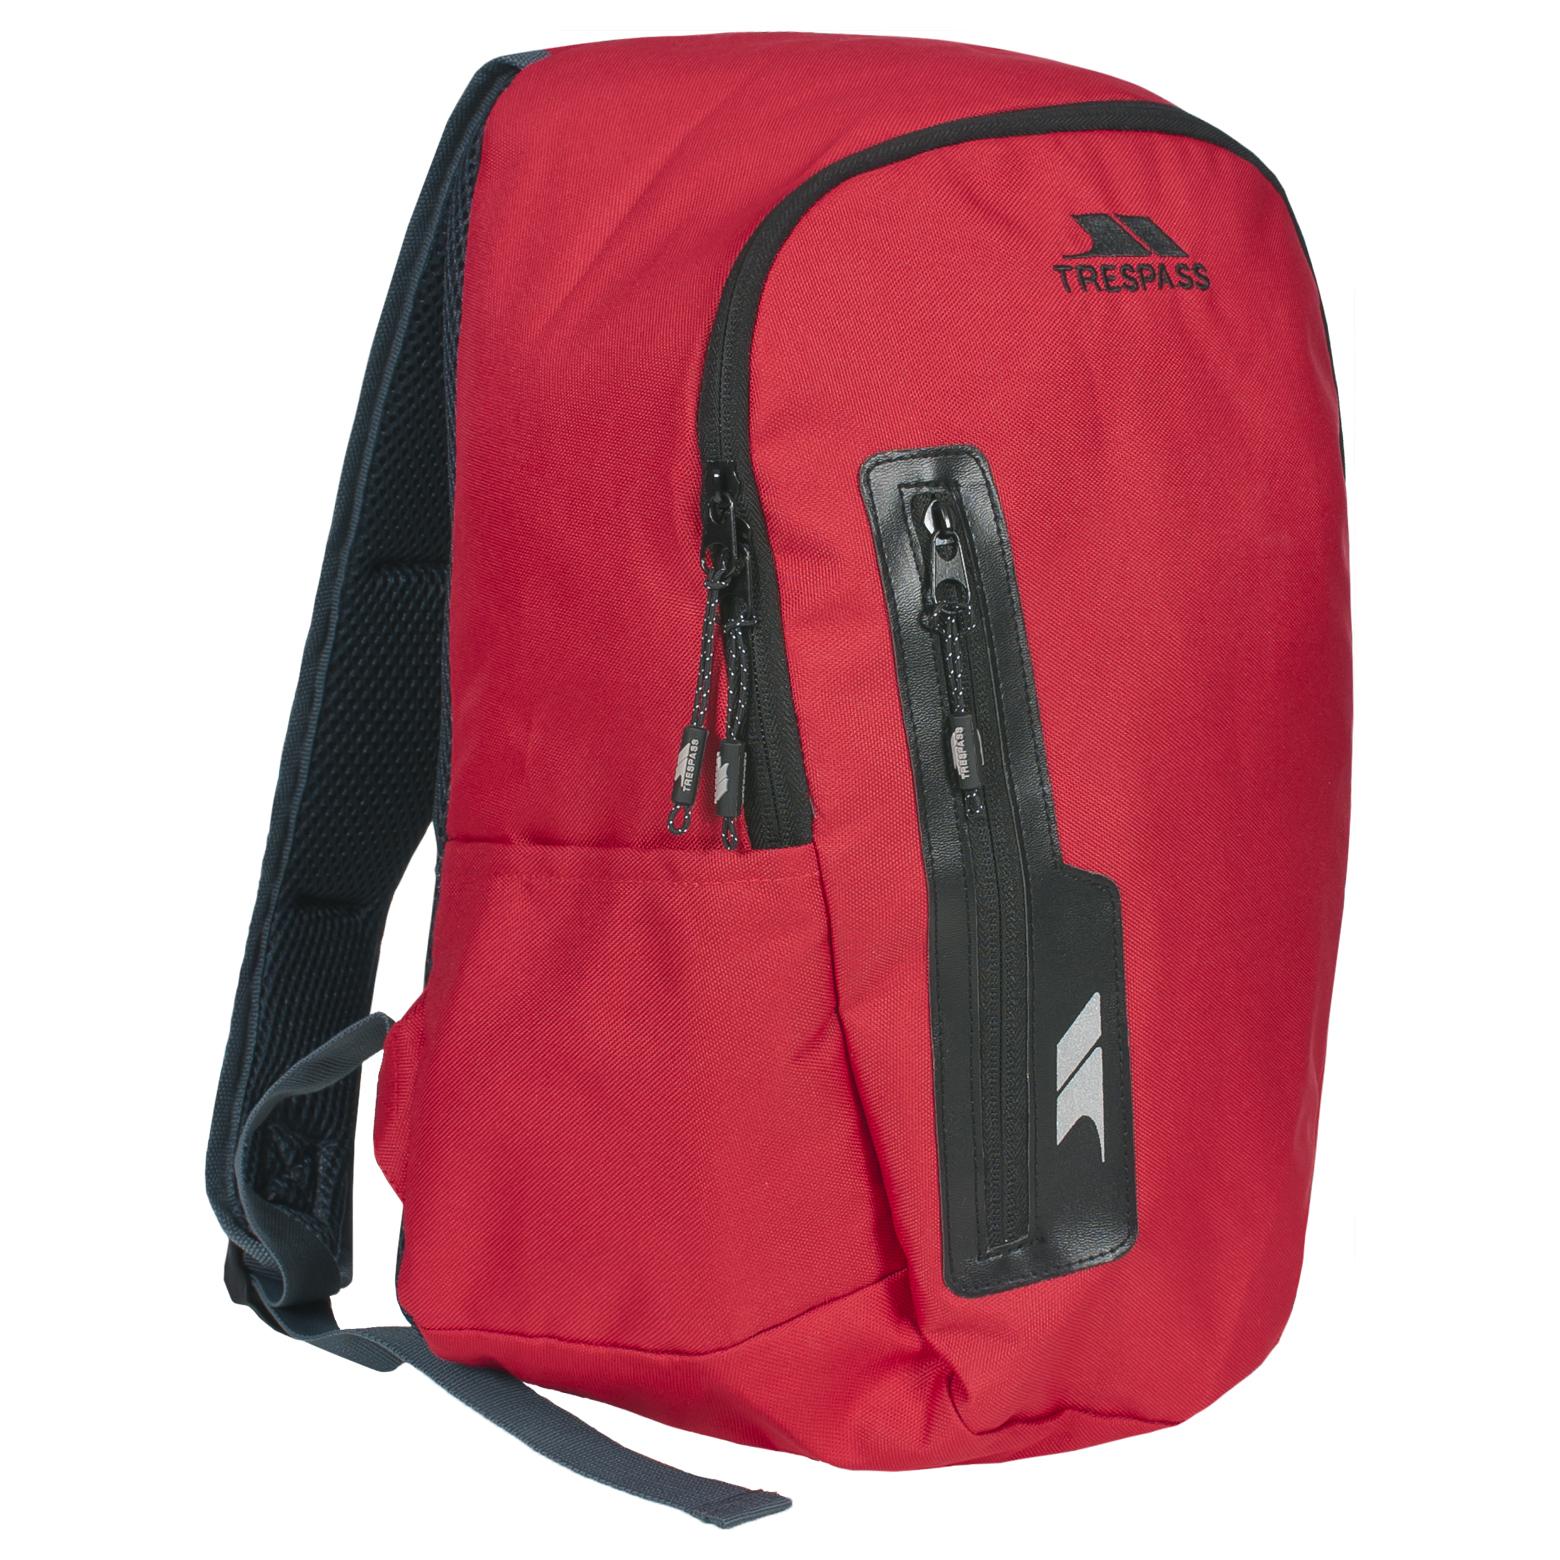 Trespass Lifty 18 Litre Backpack Work Gym Sport Hiking Rucksack